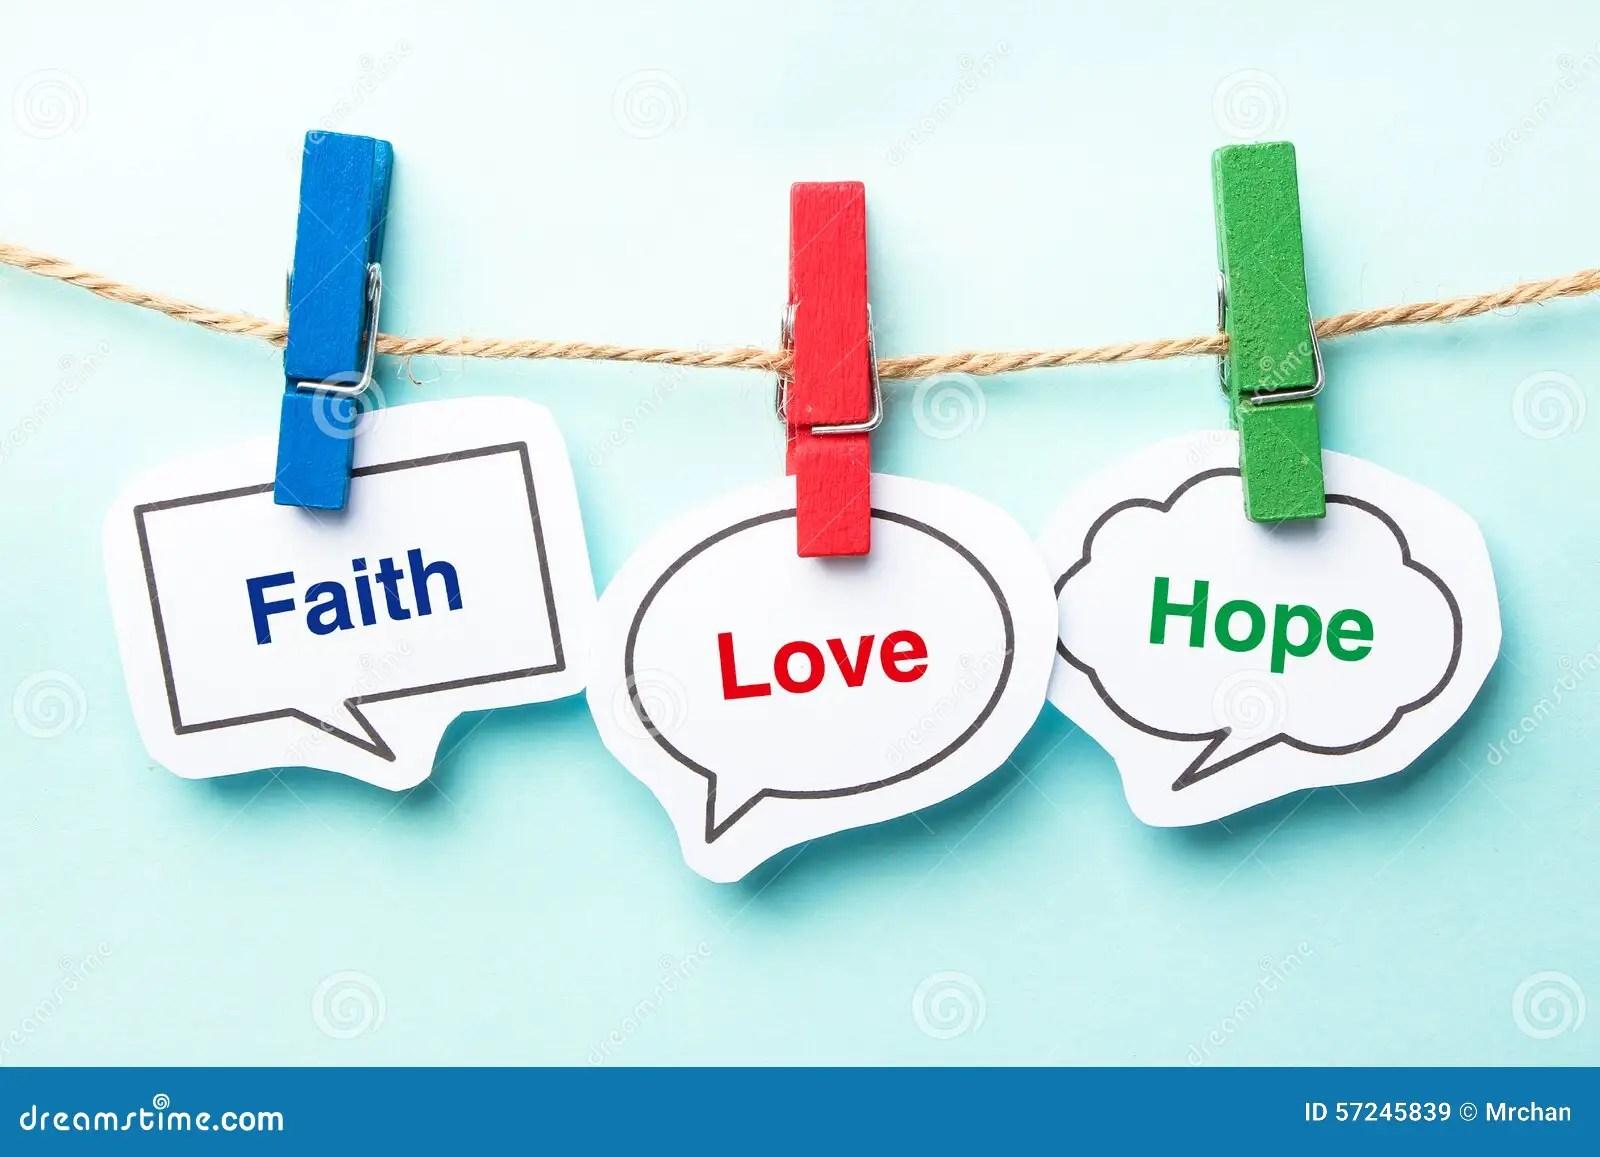 hight resolution of faith love hope